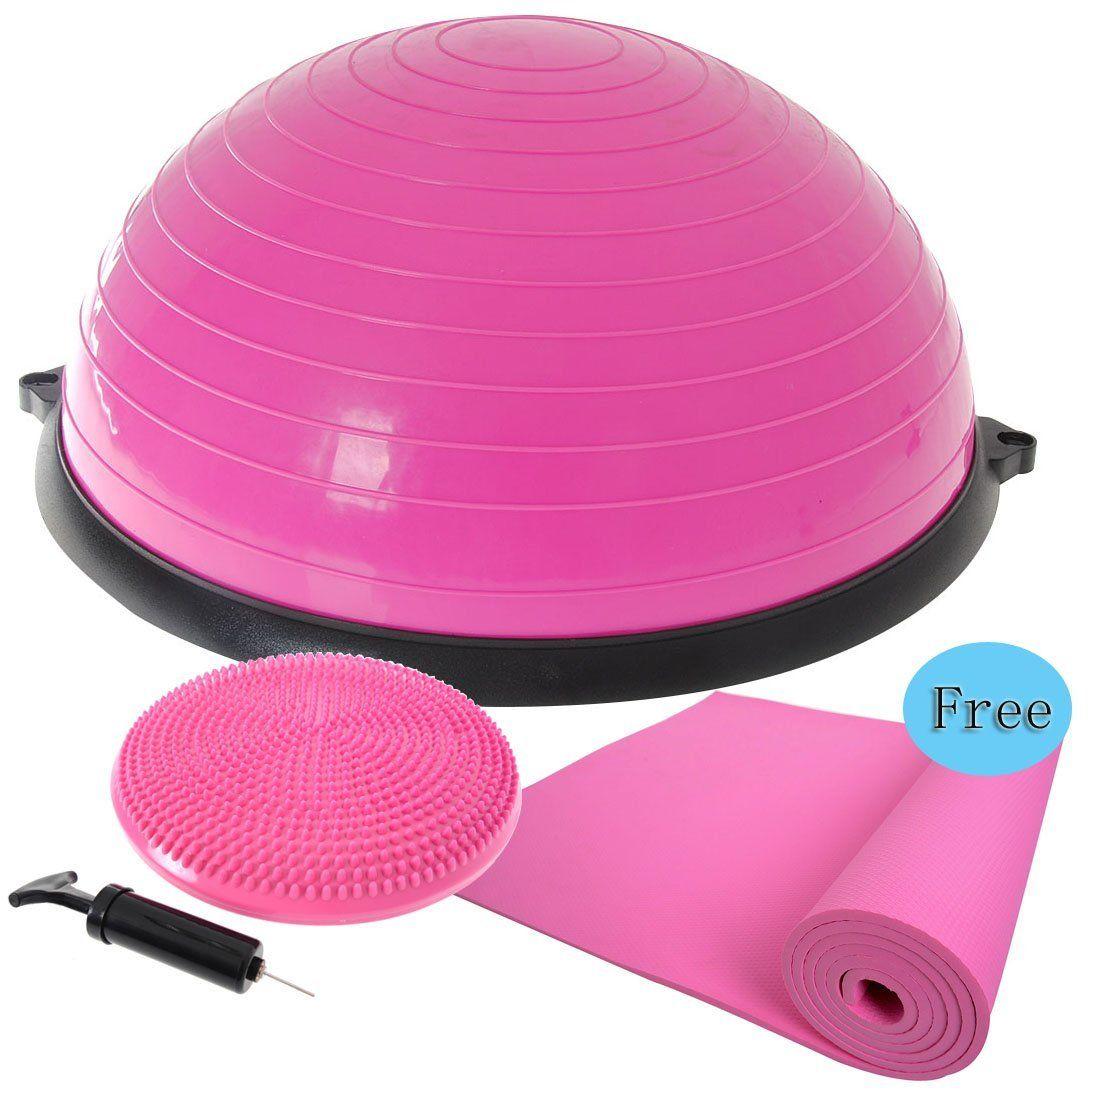 PERFORMANZ® Balance Ball Trainer for Multiple Uses Yoga/strength Training + balance disc + Free Yoga Mat (pink) $53.99 http://www.amazon.com/gp/product/B00ODP57BU/ref=as_li_qf_sp_asin_il_tl?ie=UTF8&camp=1789&creative=9325&creativeASIN=B00ODP57BU&linkCode=as2&tag=changnatio-20&linkId=Y4PRYZQ46CJQ2LUB